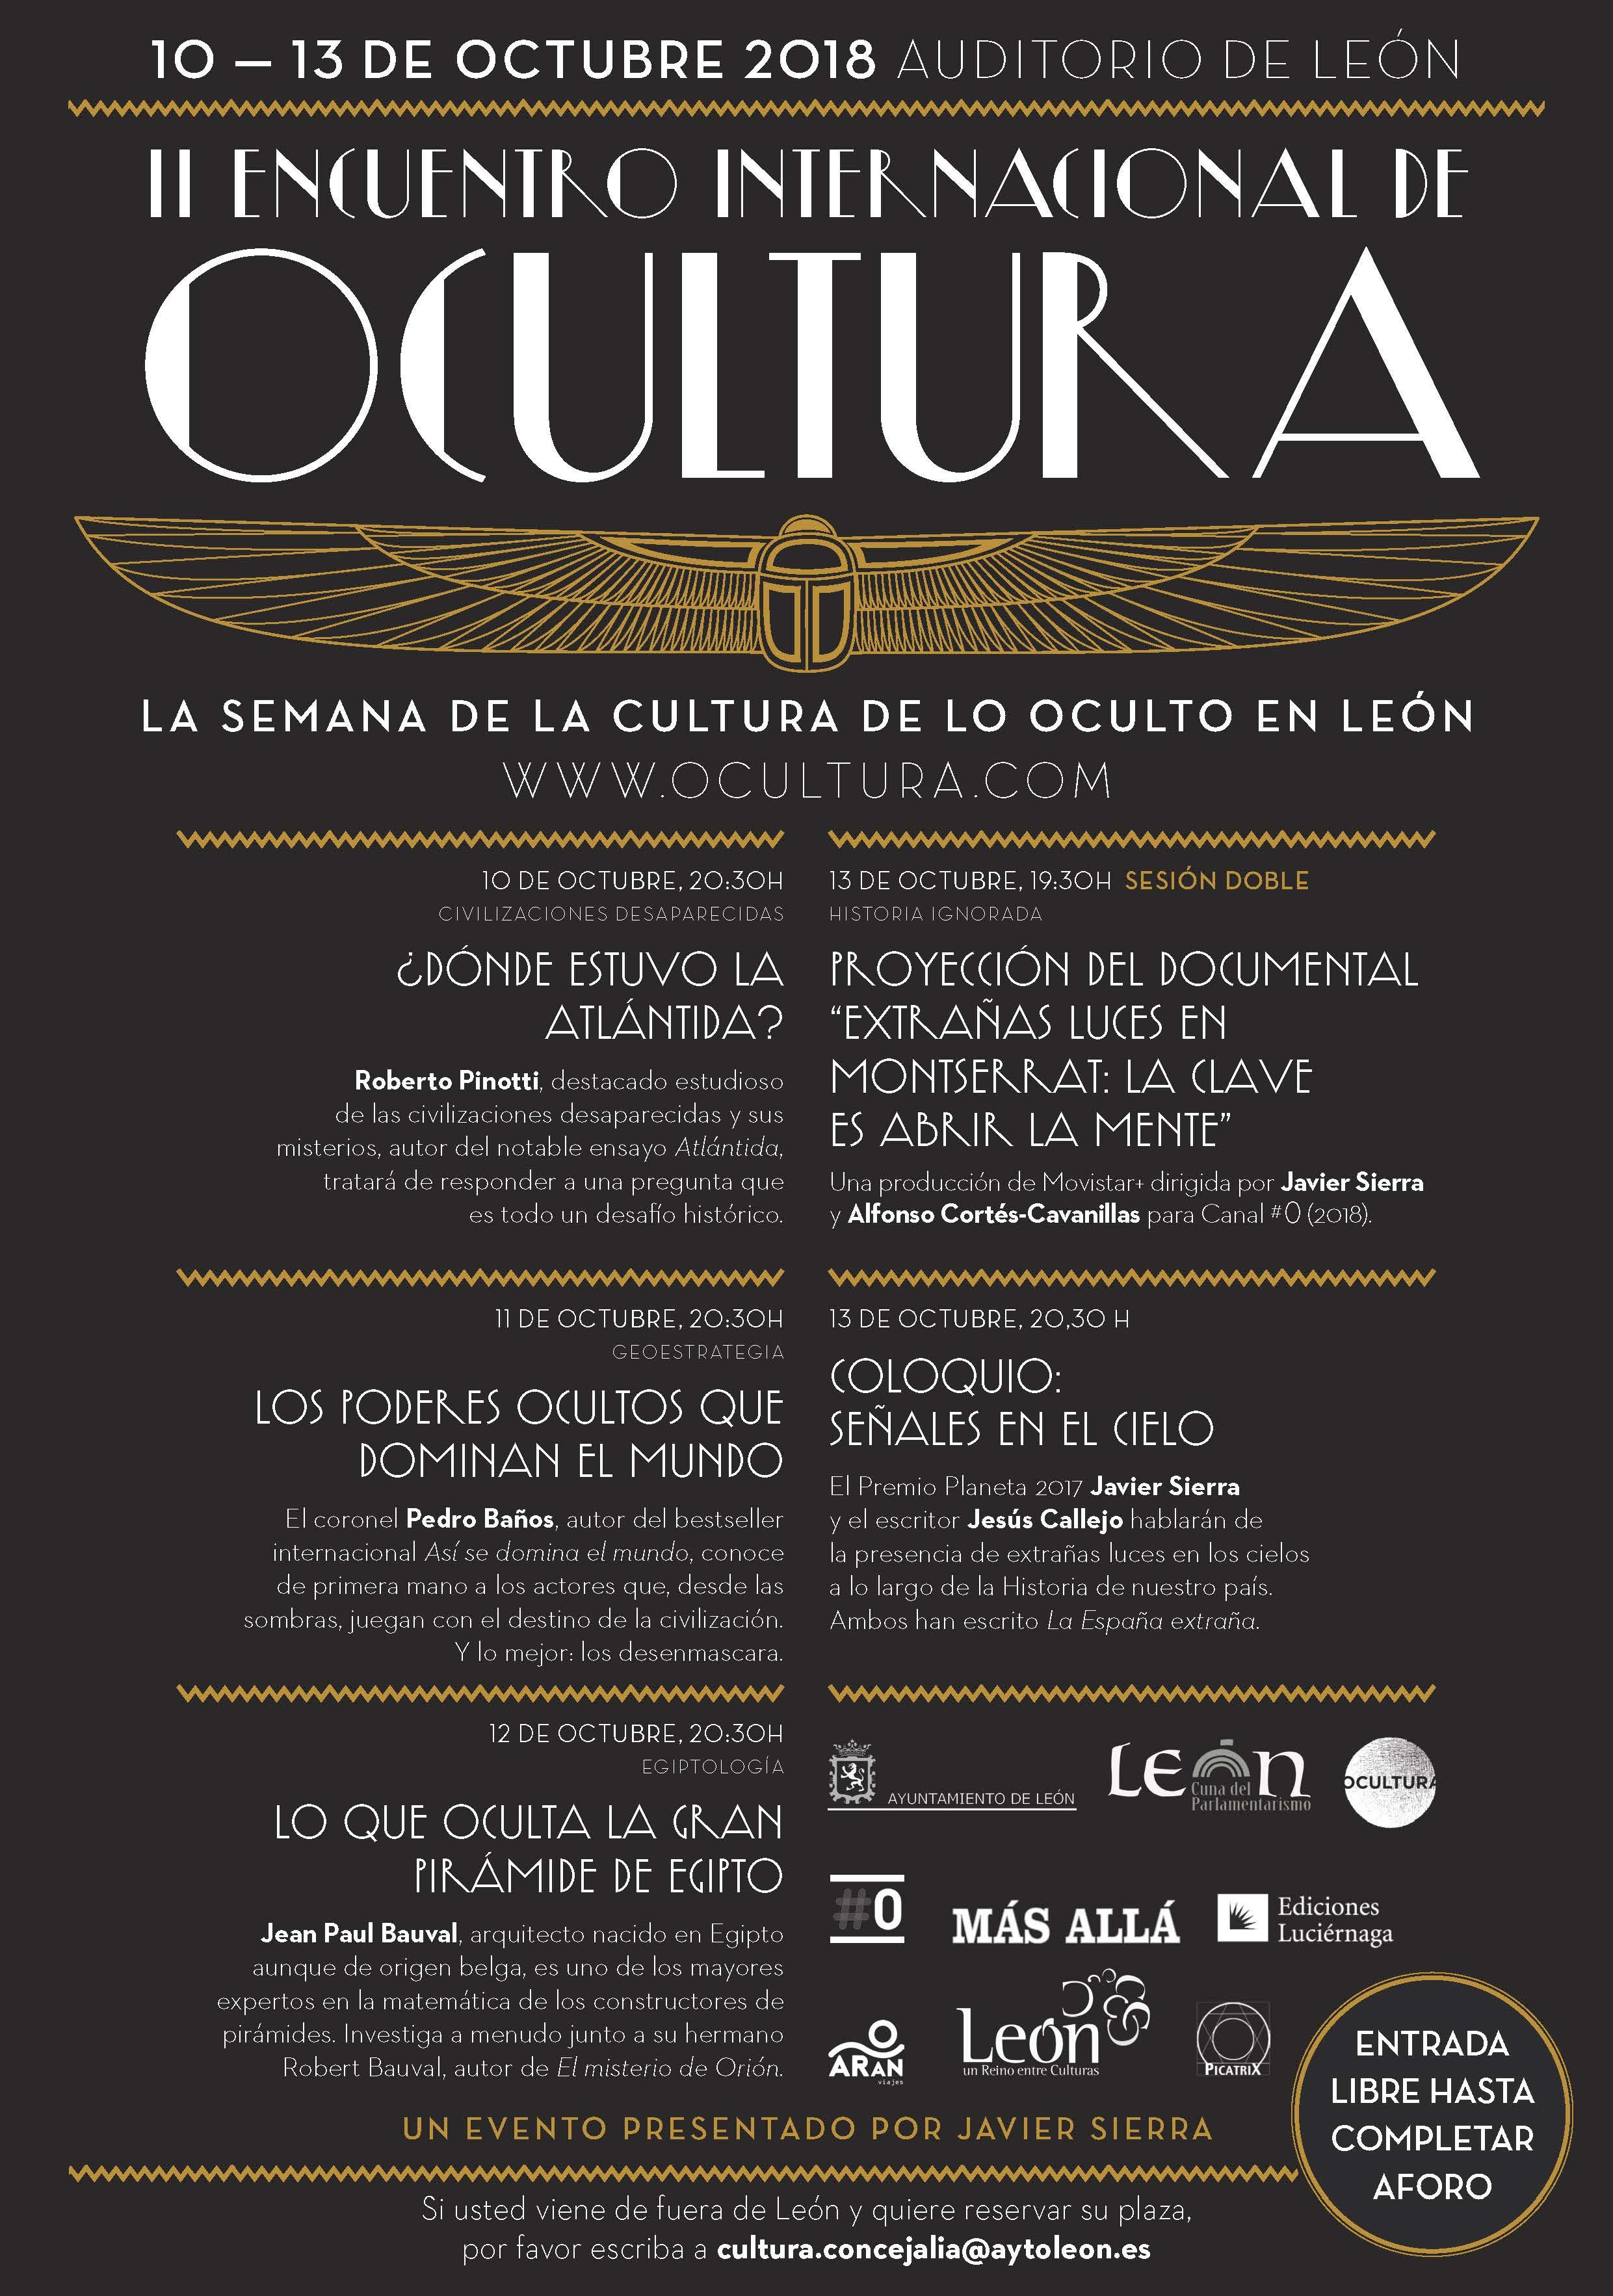 II Encuentro Internacional de Ocultura